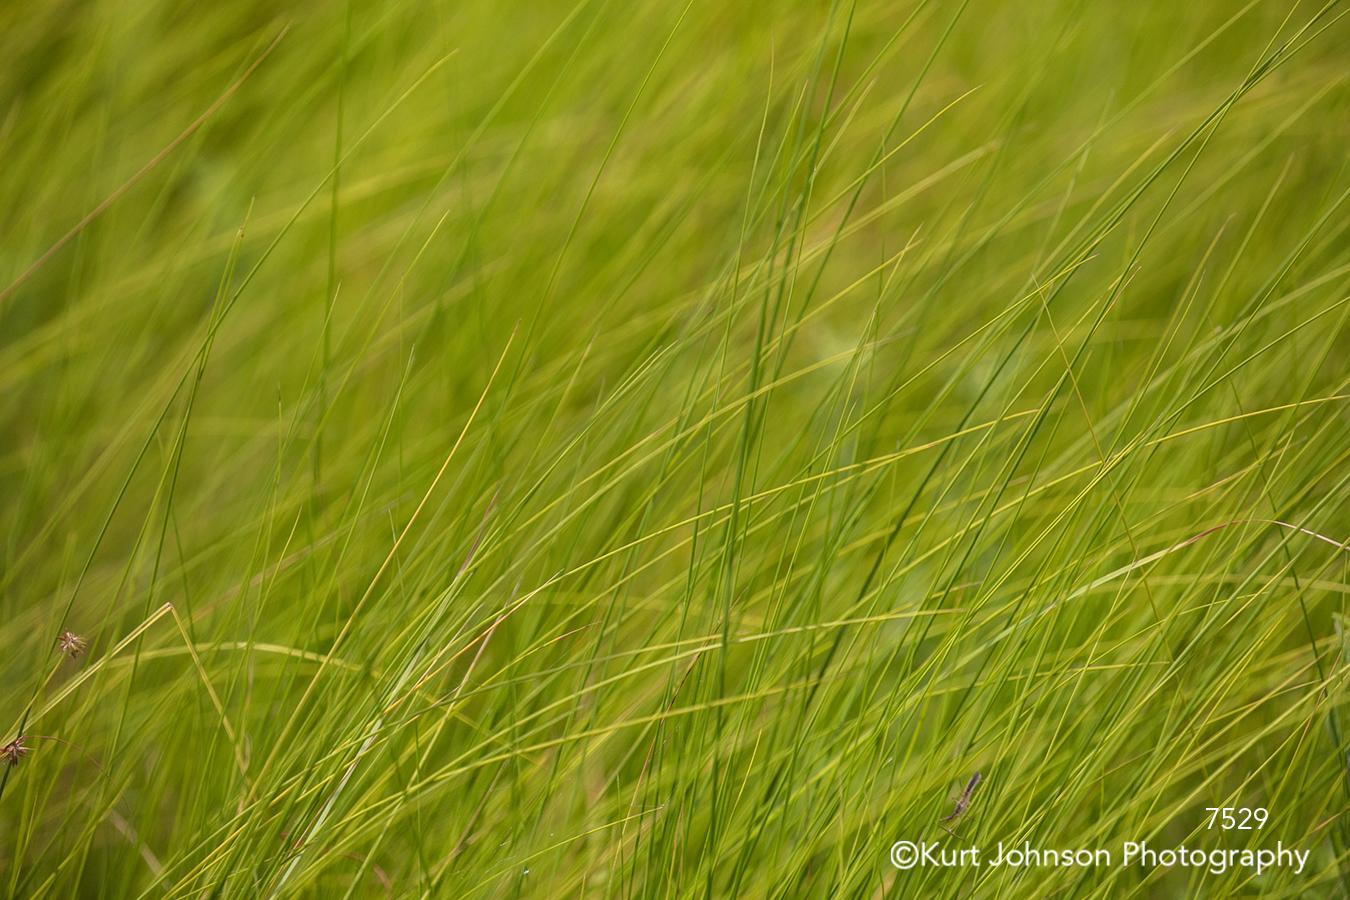 green grass grasses lines pattern texture close up detail